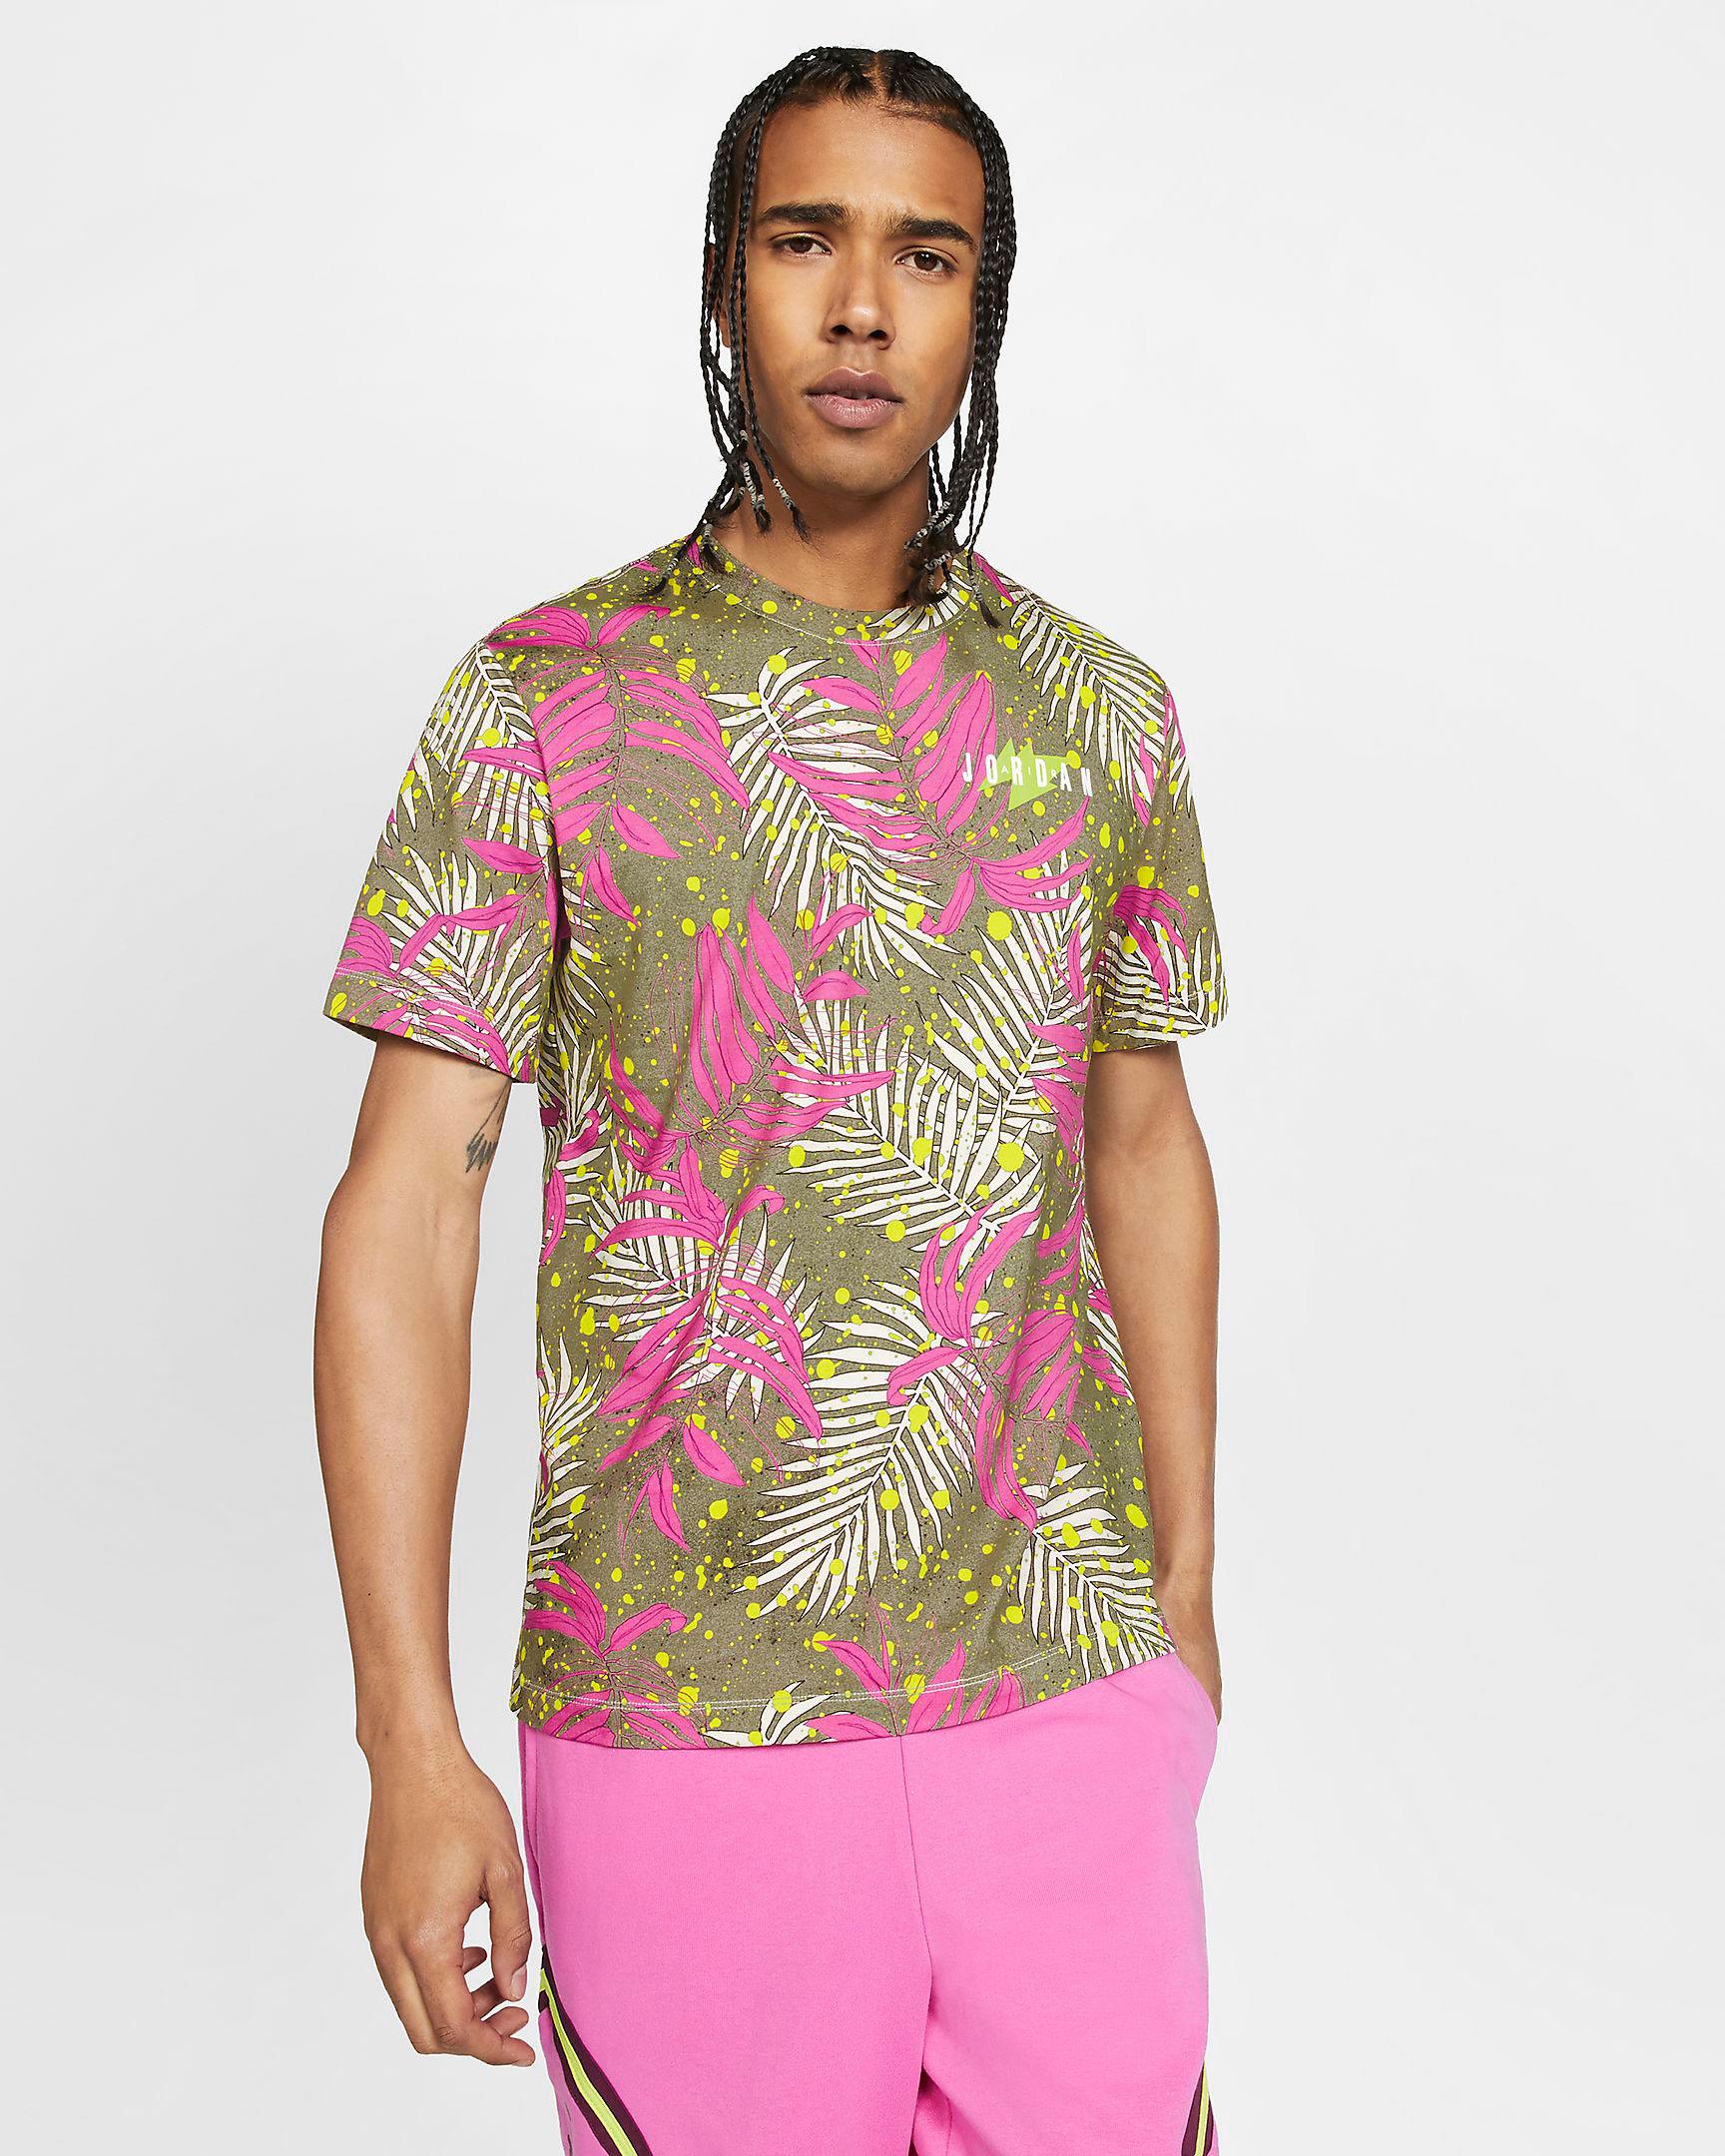 air-jordan-5-bel-air-alternate-matching-shirt